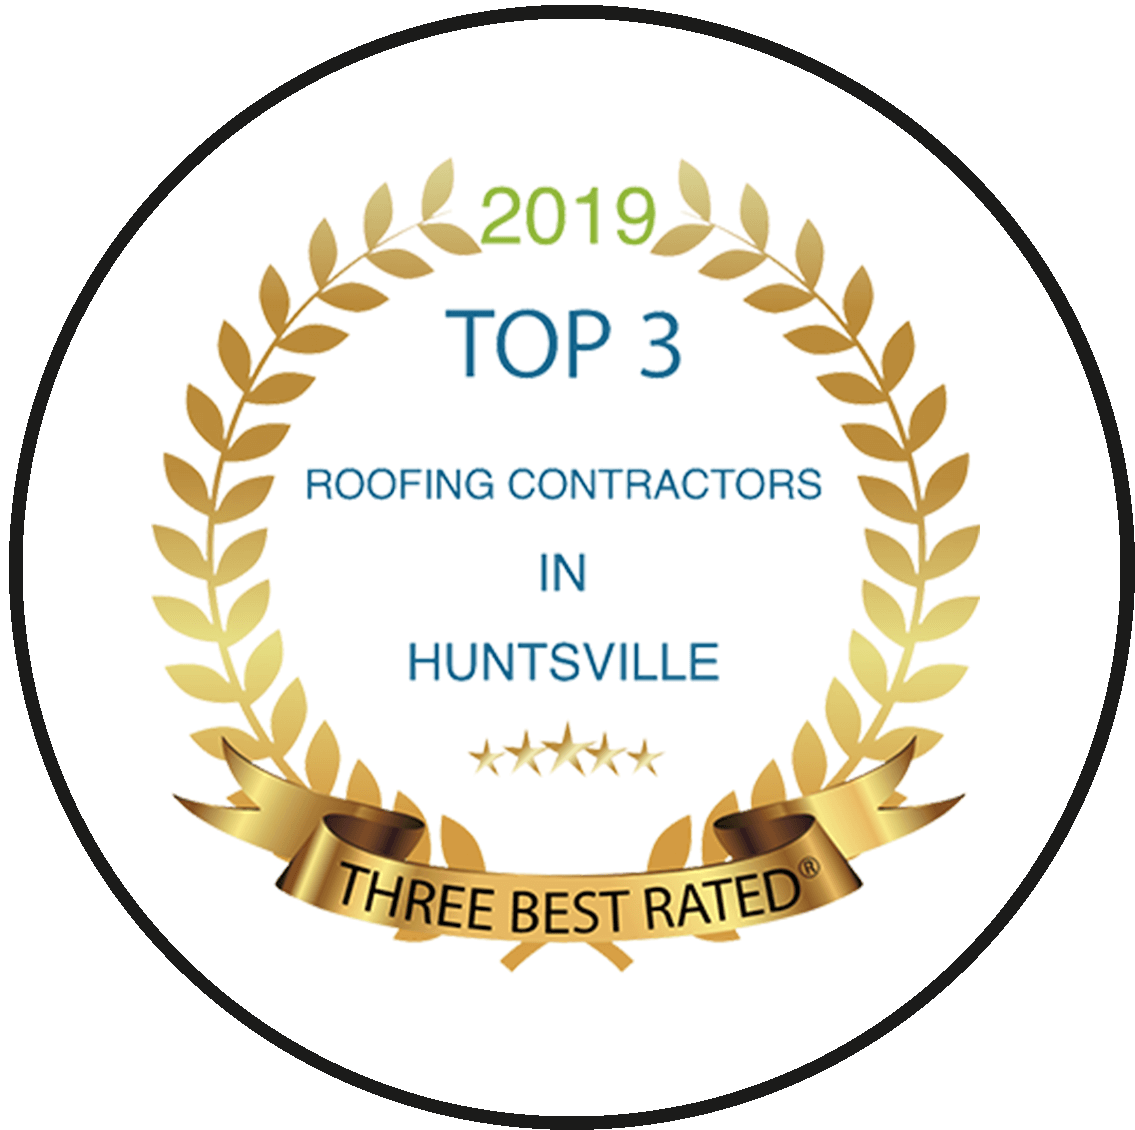 Top3 in hunstville 2019 award